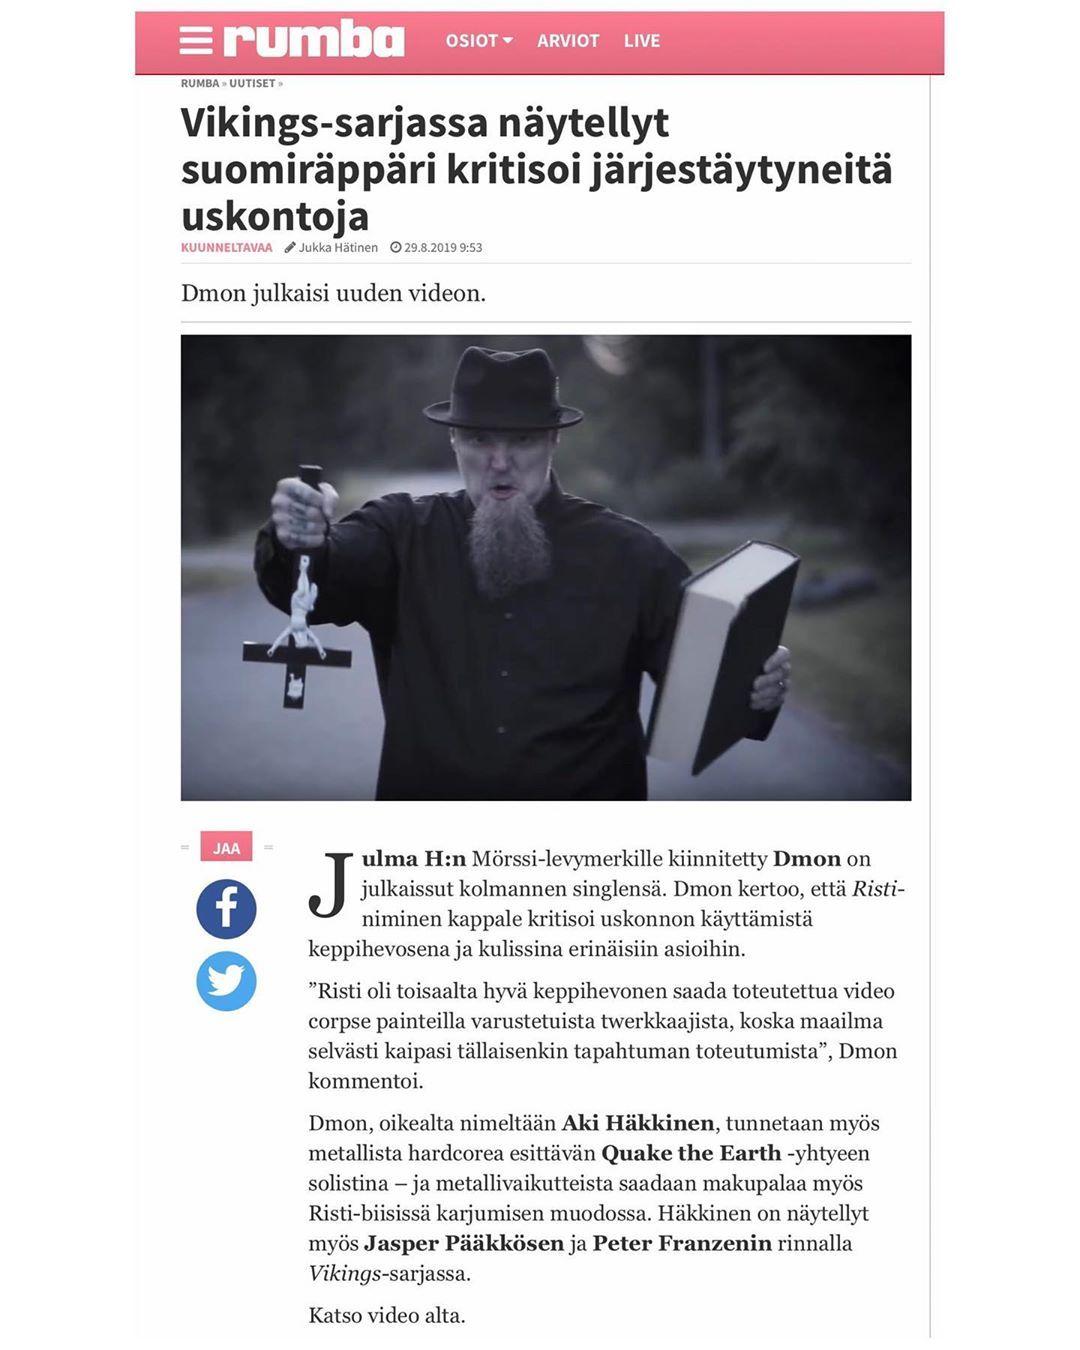 Dj Aukusti, musiikin 10+3 parhaat jutut 2017 in no particular order